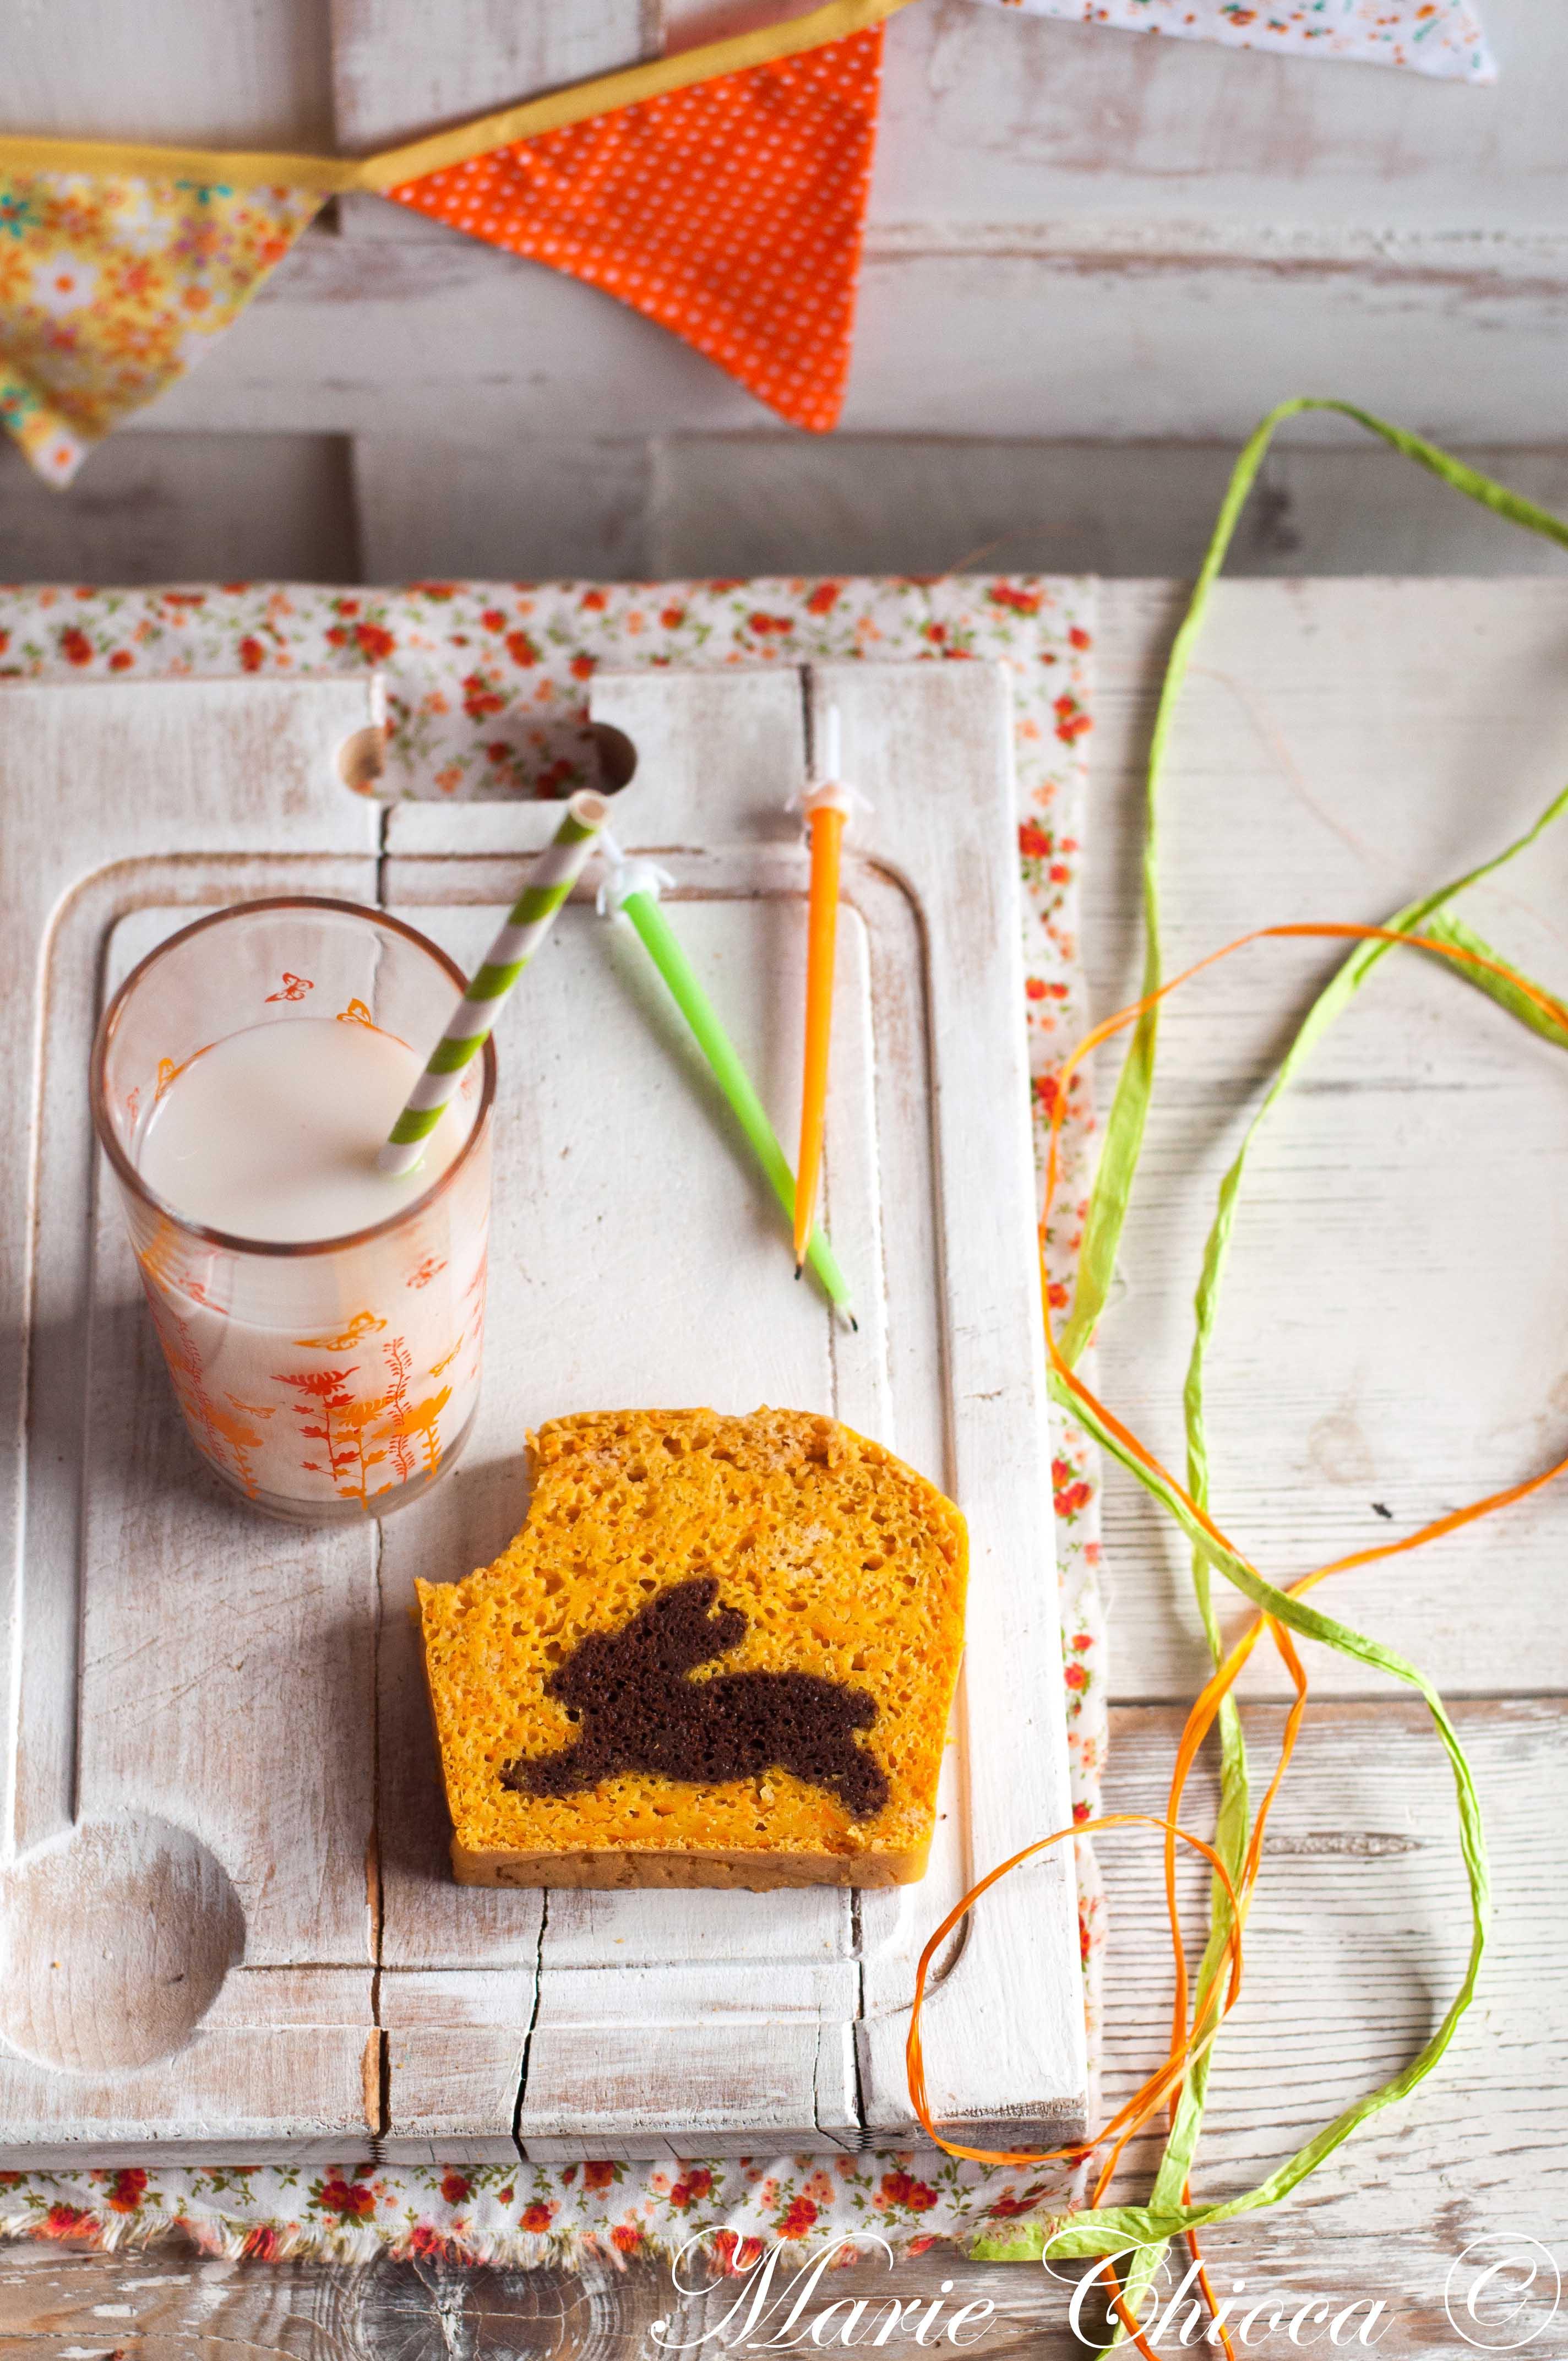 Carrot-cake surprise 9